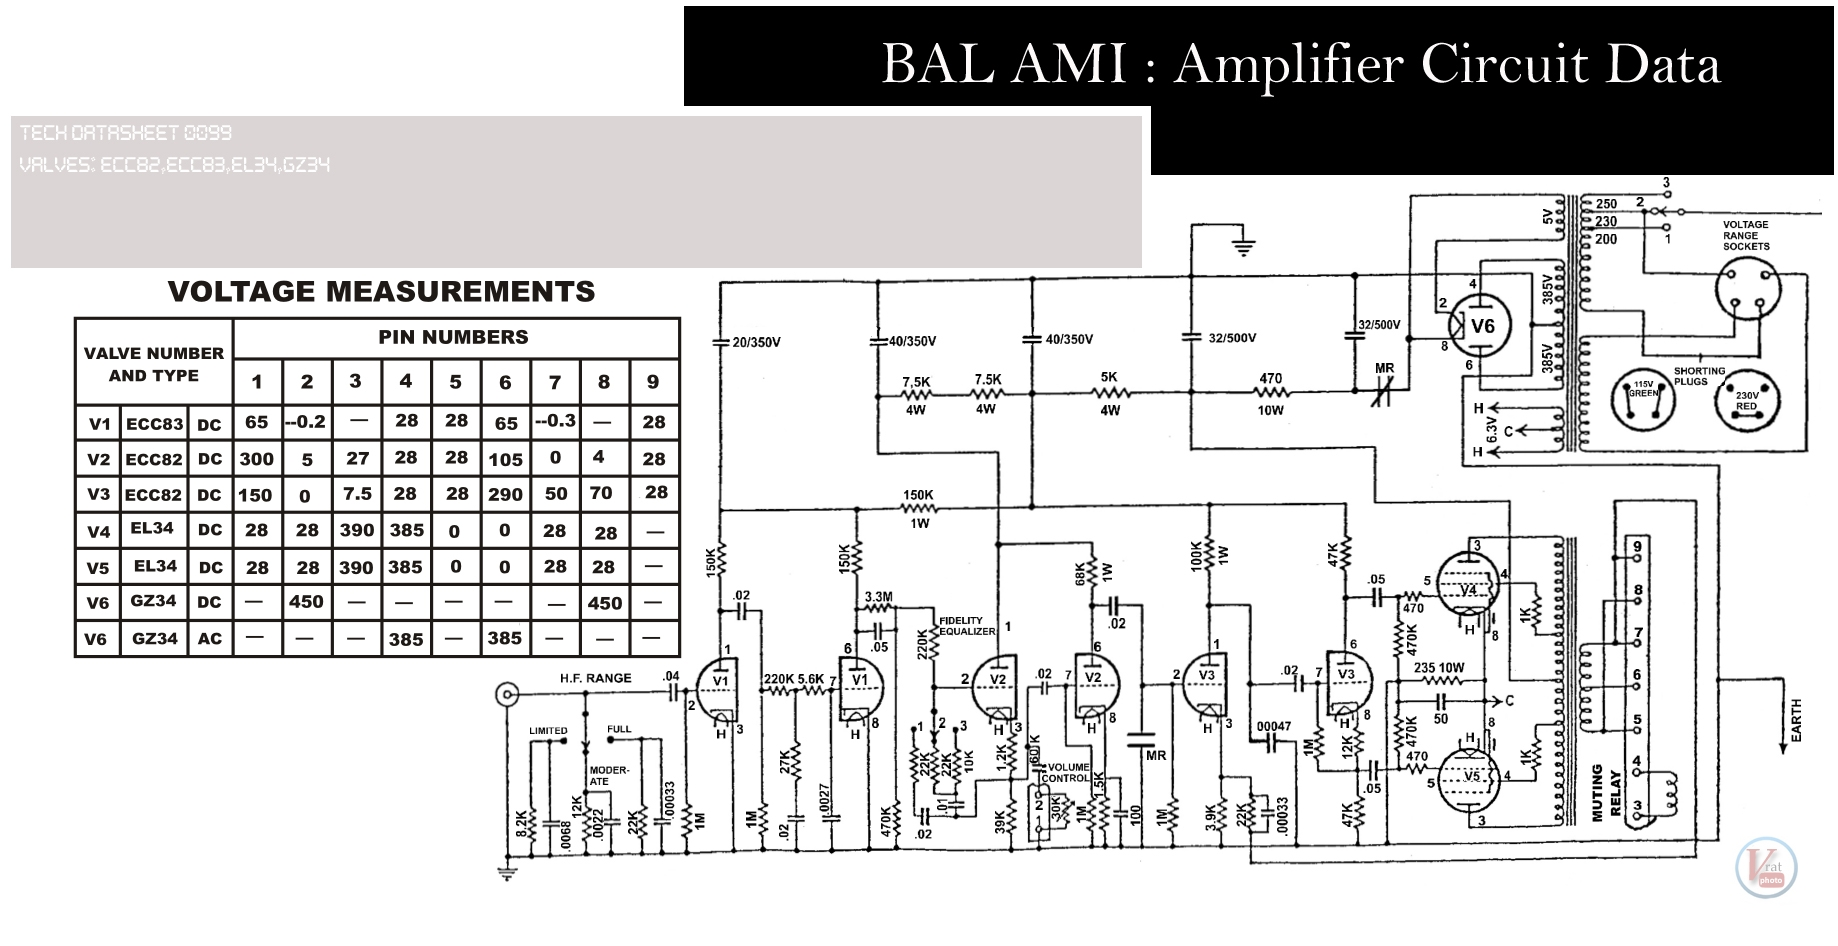 BAL AMI: Amplifier Circuit 1